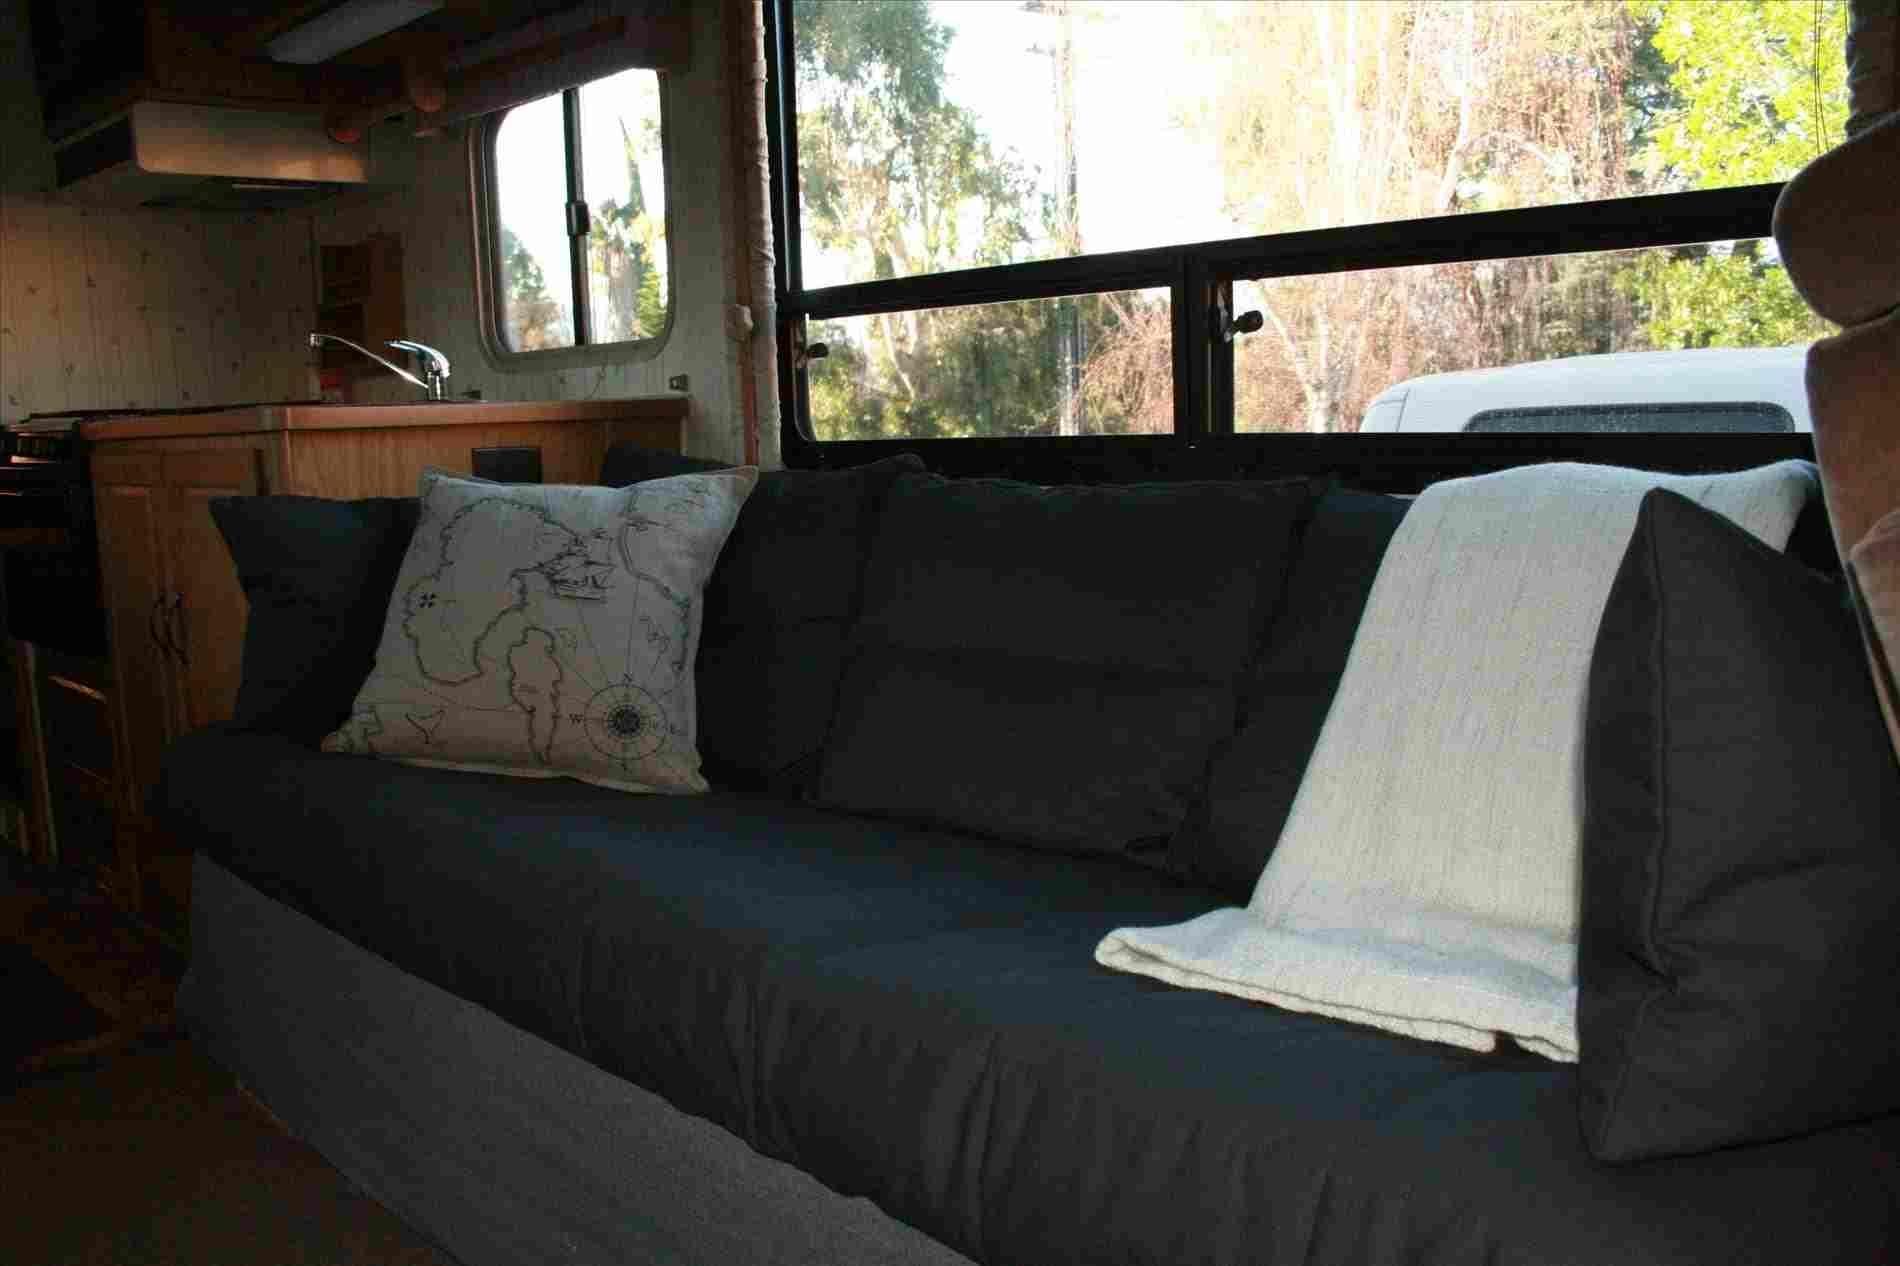 Jackknife Sofa For Rv | Sofa And Chair Information inside Rv Jackknife Sofas